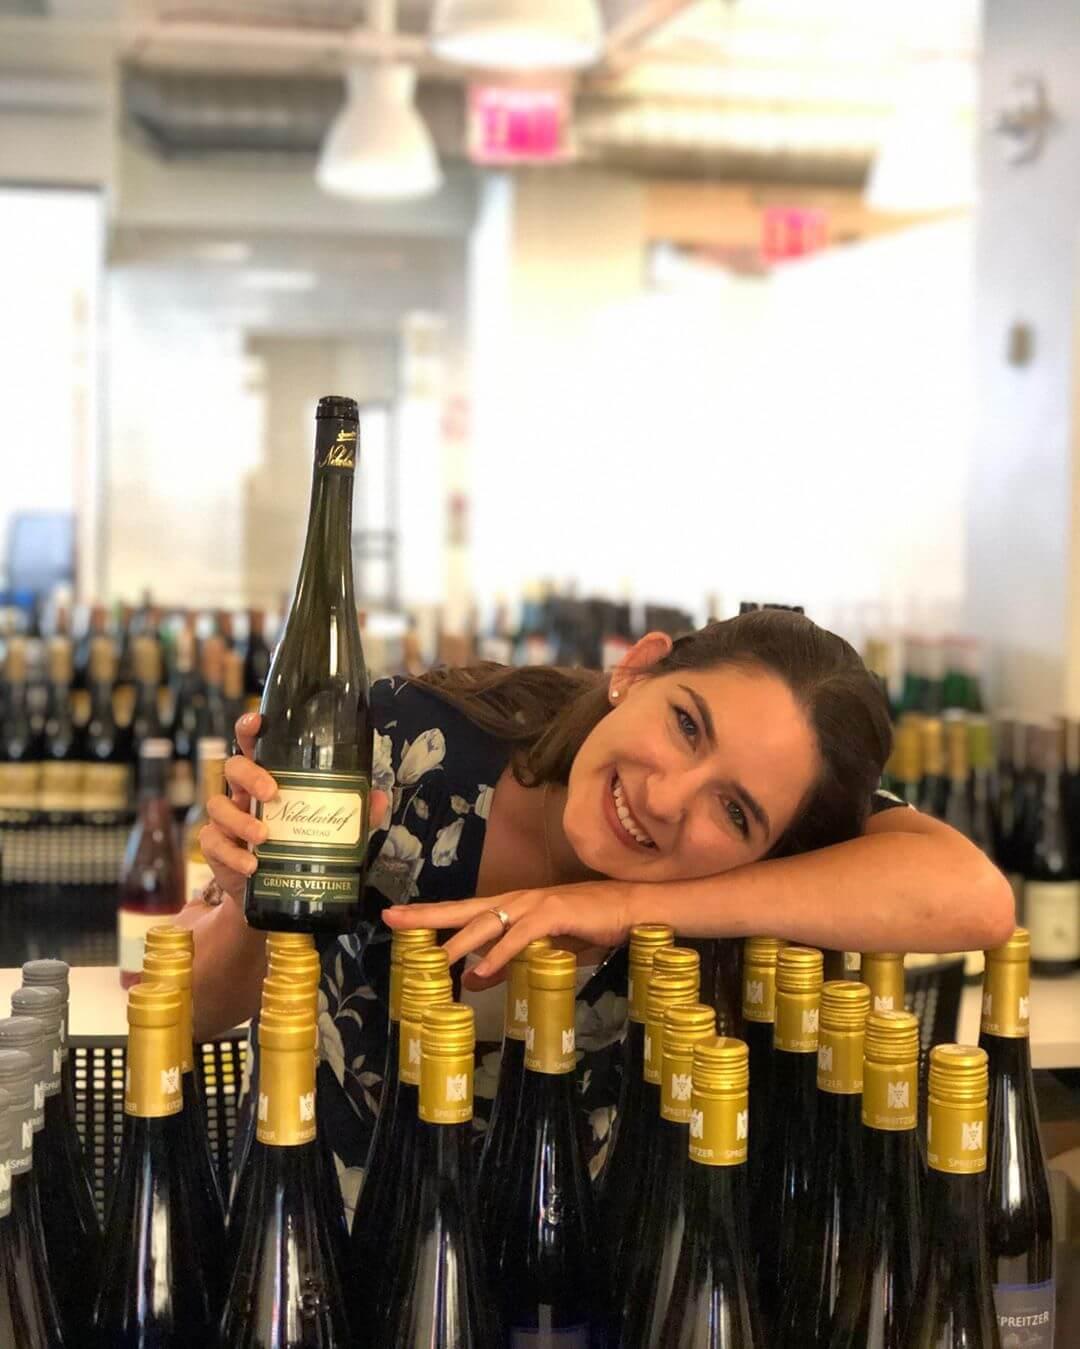 Skurnik Wine & Spirits